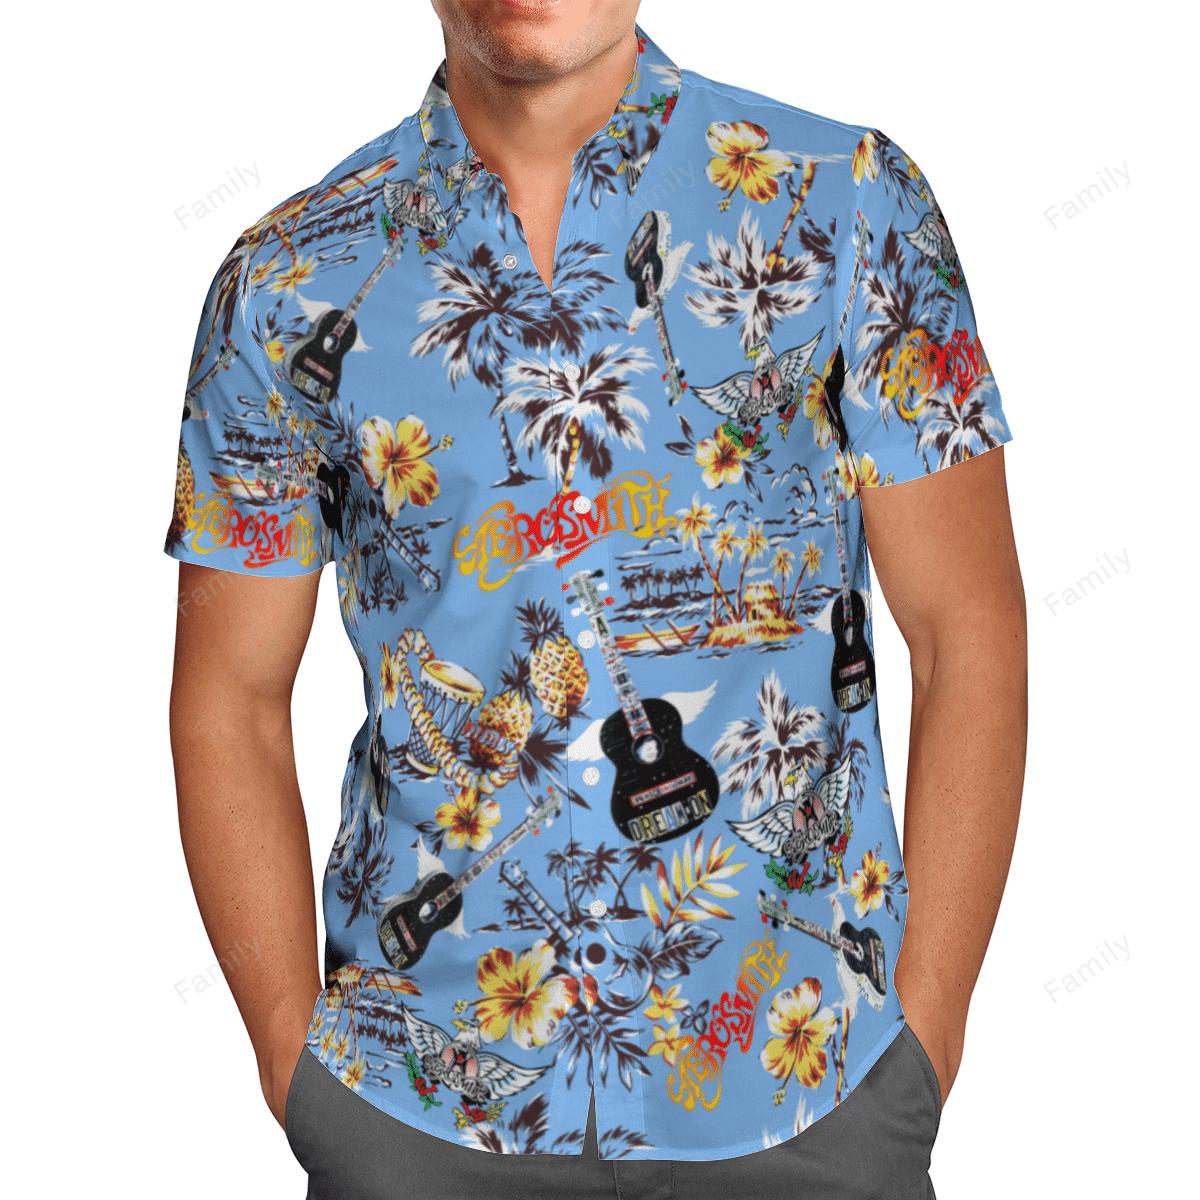 Aerosmith band blue Hawaiian shirt 1